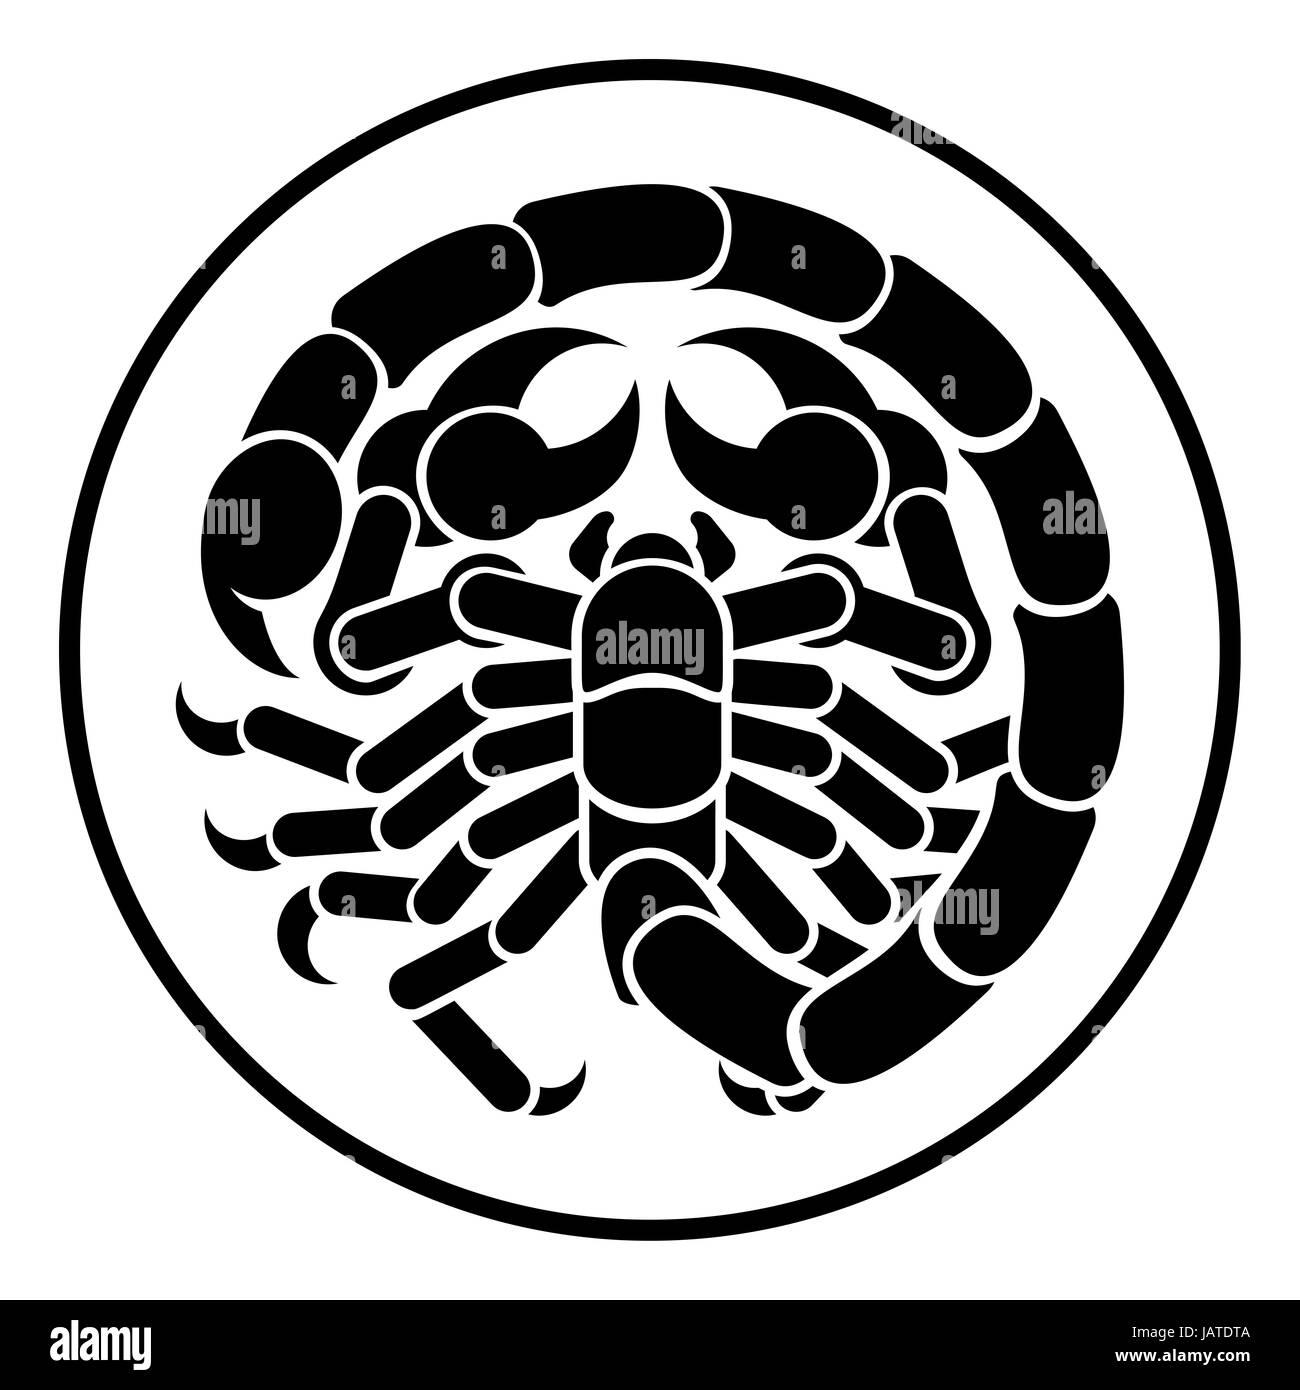 Scorpio scorpion horoscope astrology zodiac sign icon - Stock Image